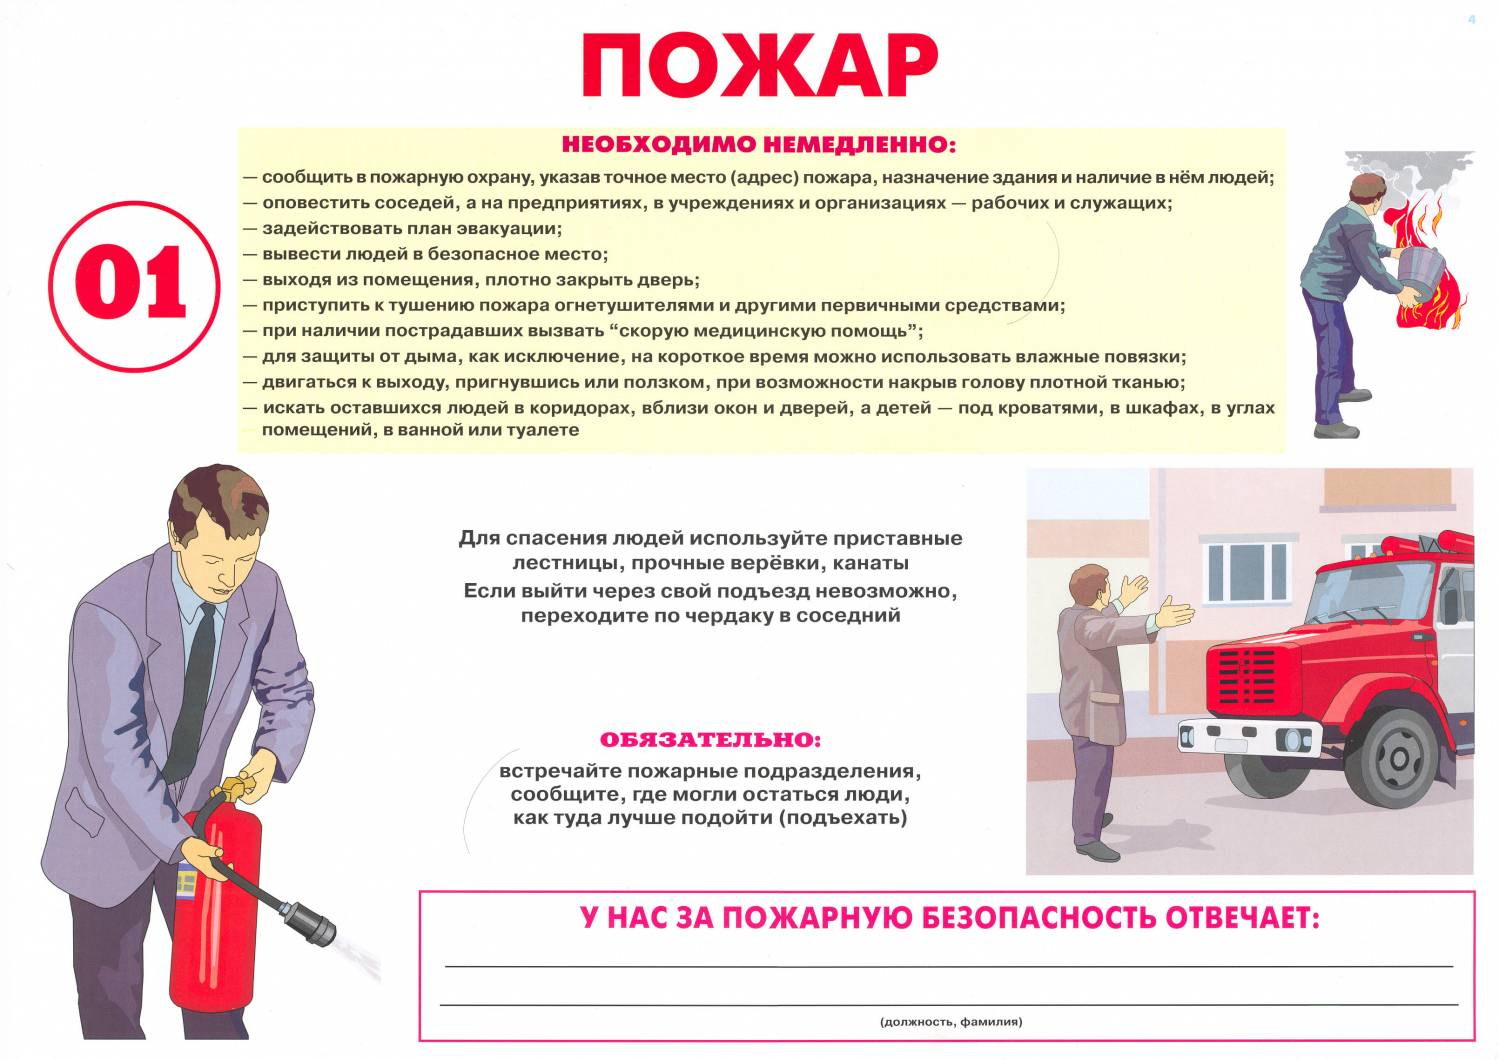 http://novospasskoe.do.am/_nw/2/00199776.jpg